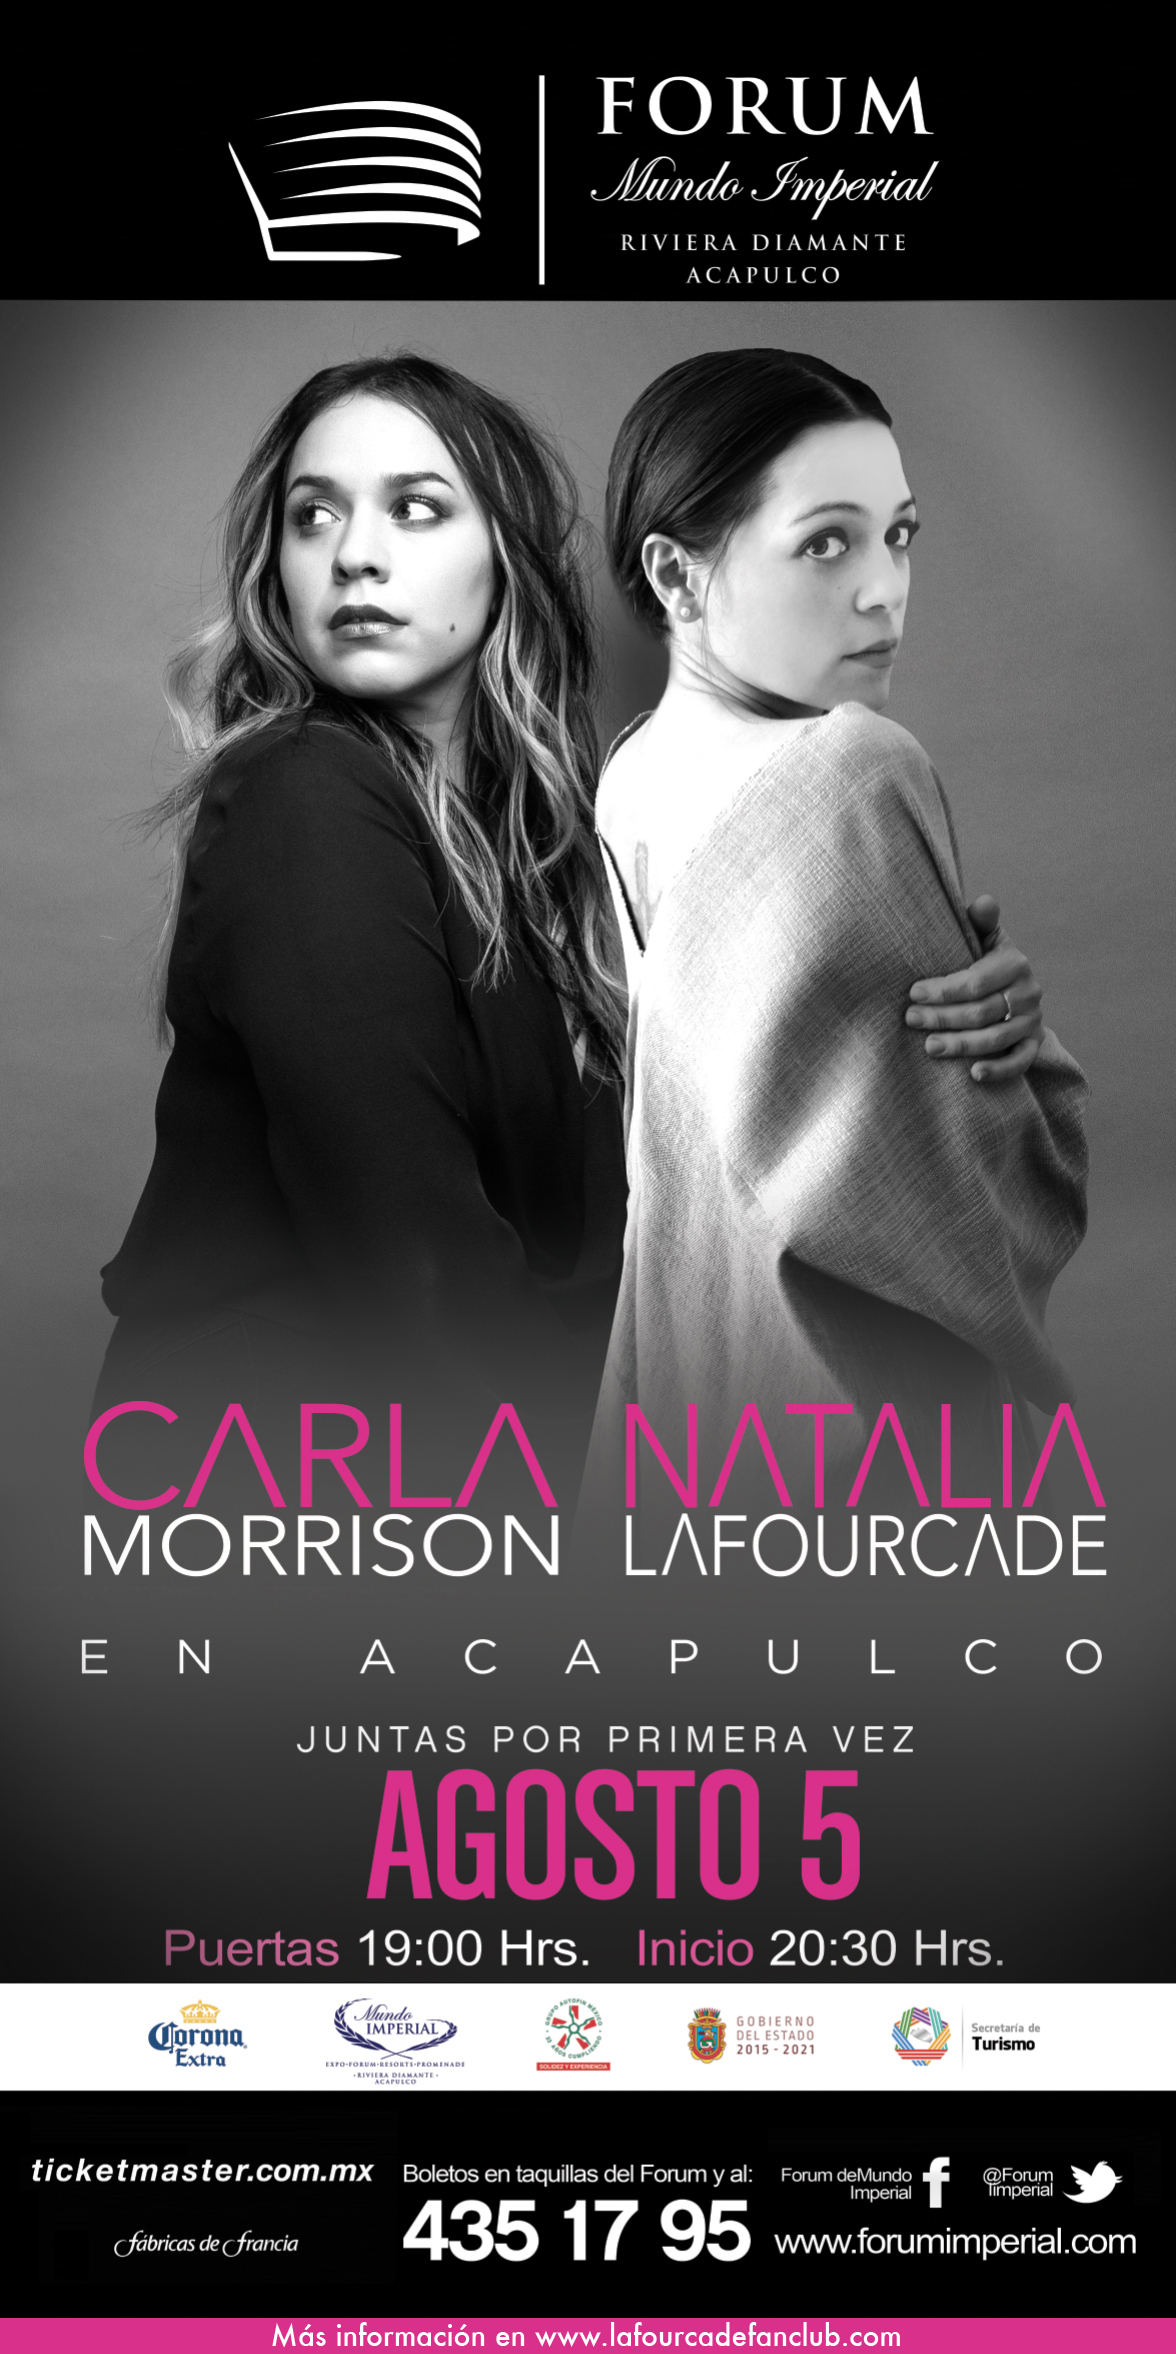 2017-08-05-Acapulco-Carla-Morrison-Natalia-Lafourcade-3